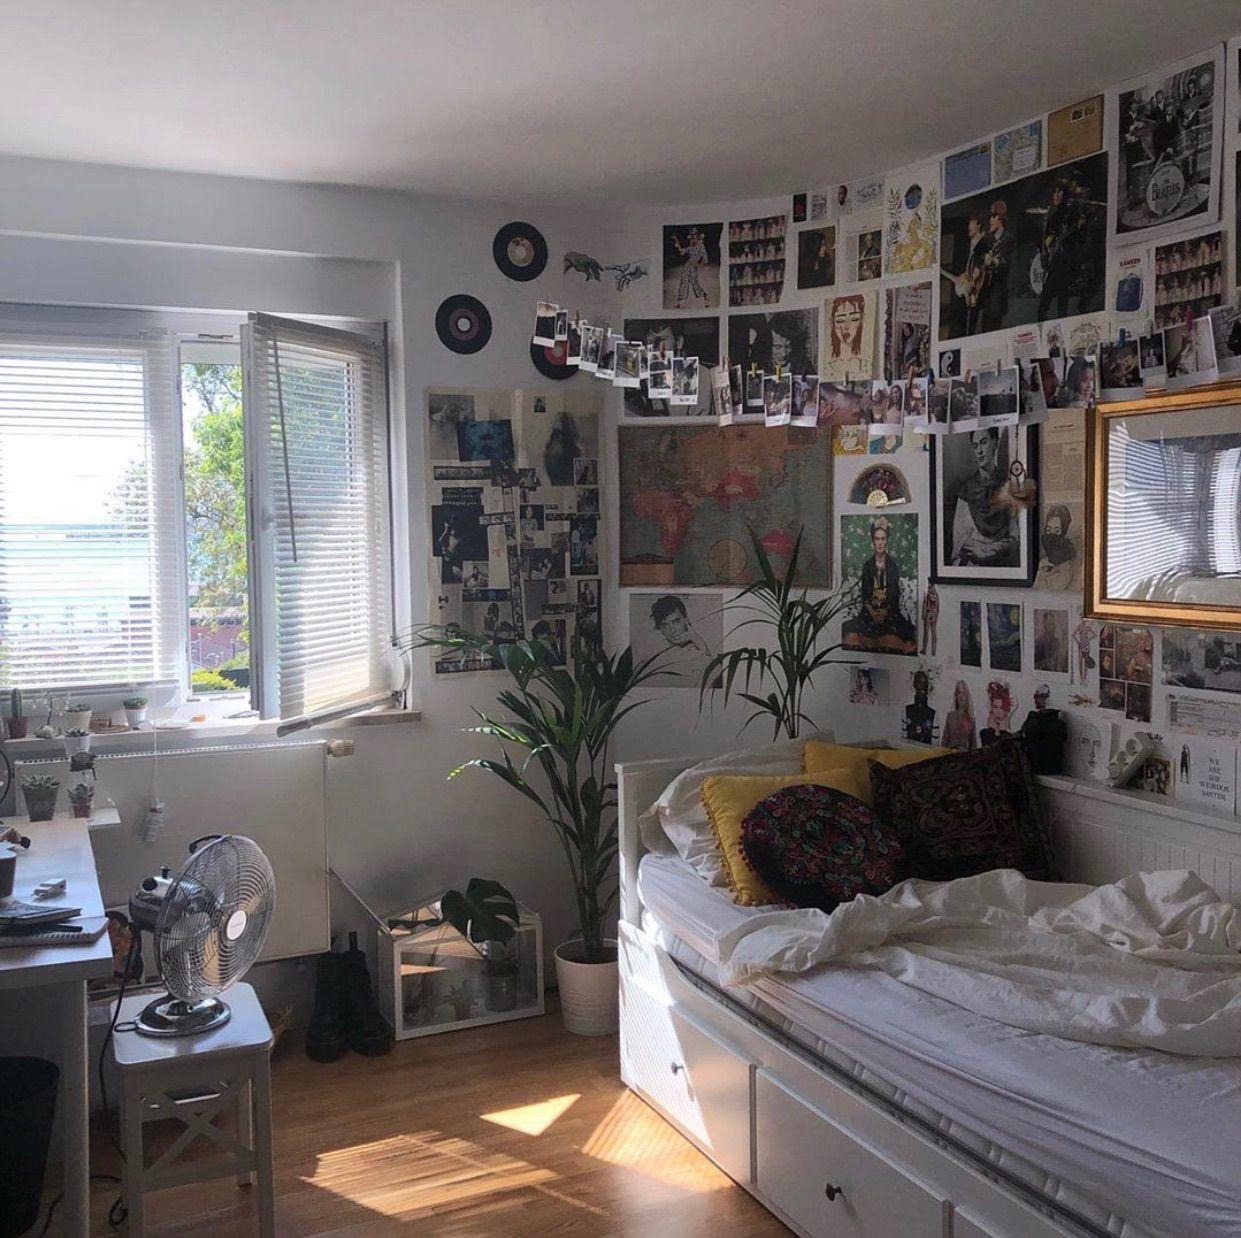 Retro Grunge Aesthetic Tiktok Bedroom Decor Homyracks